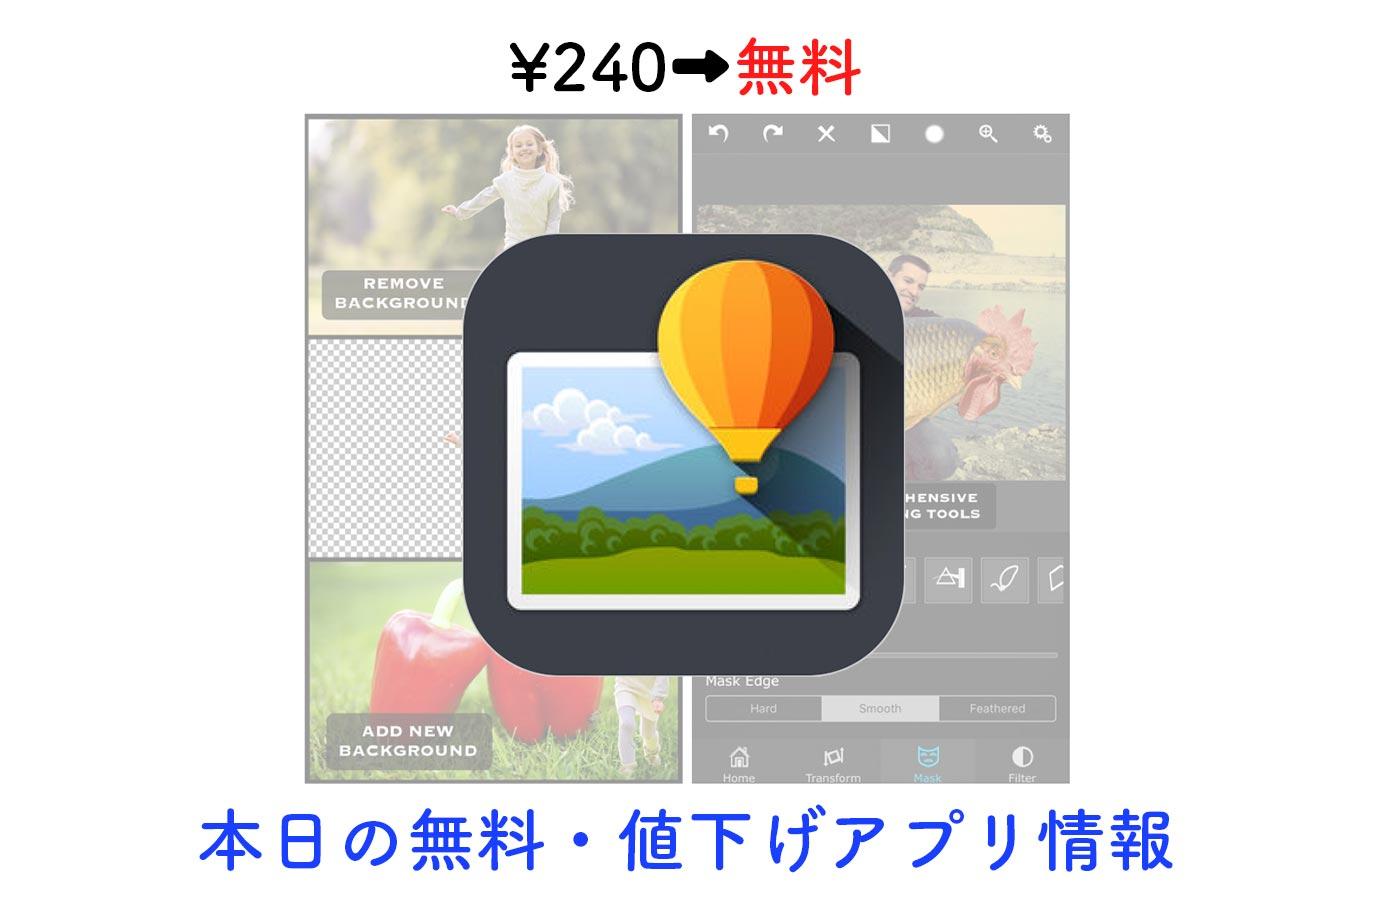 Appsale1229